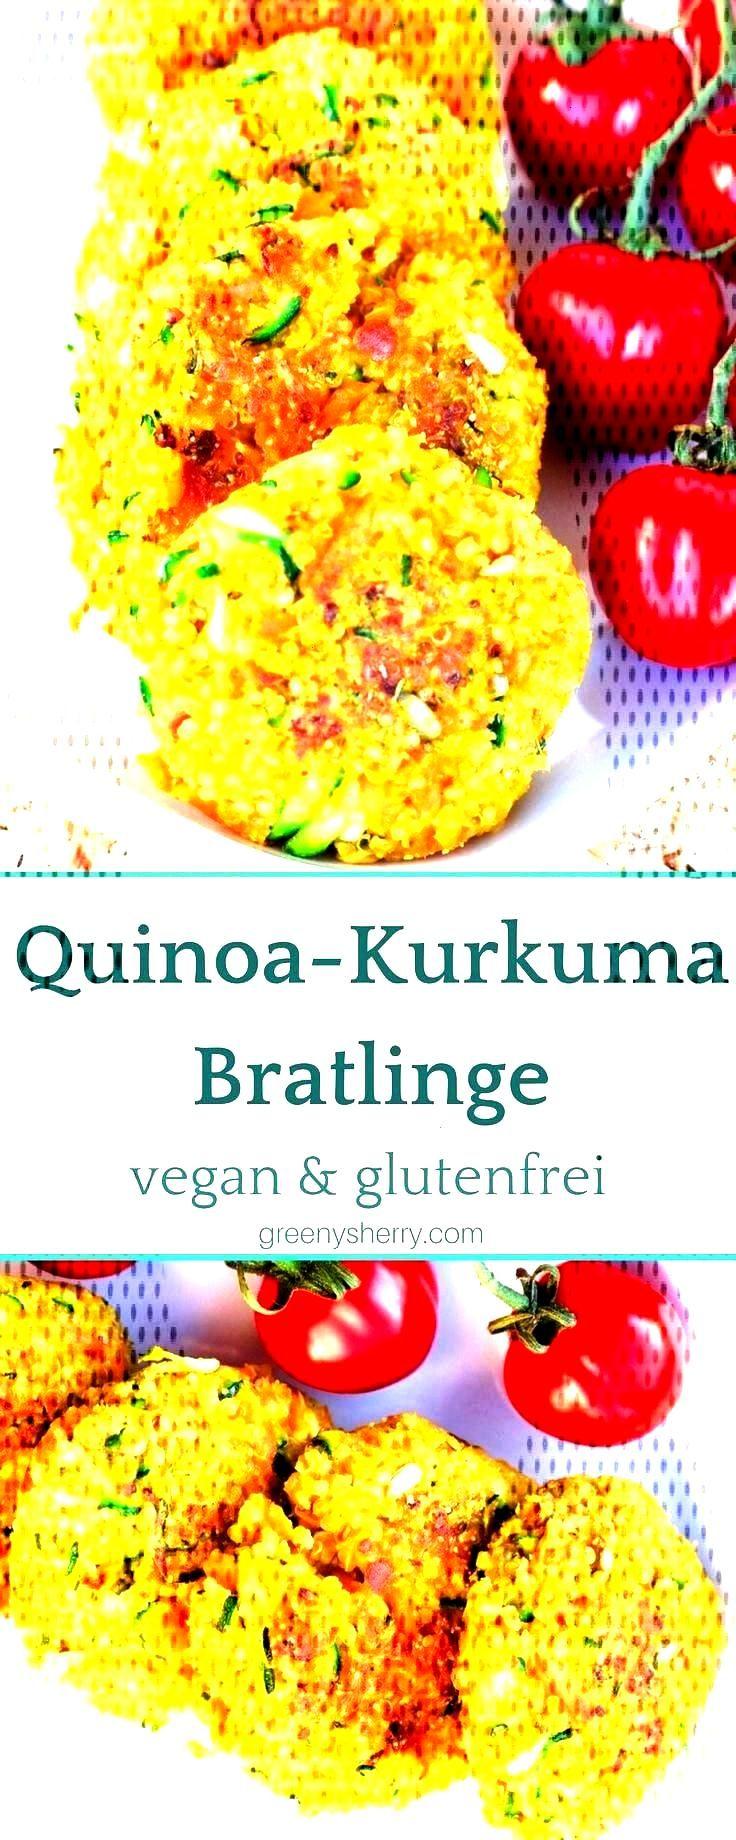 Crunchy Quinoa - Kurkumapastetchen (vegan amp glutenfrei)  - Rezepte -You can find Quinoa and more o